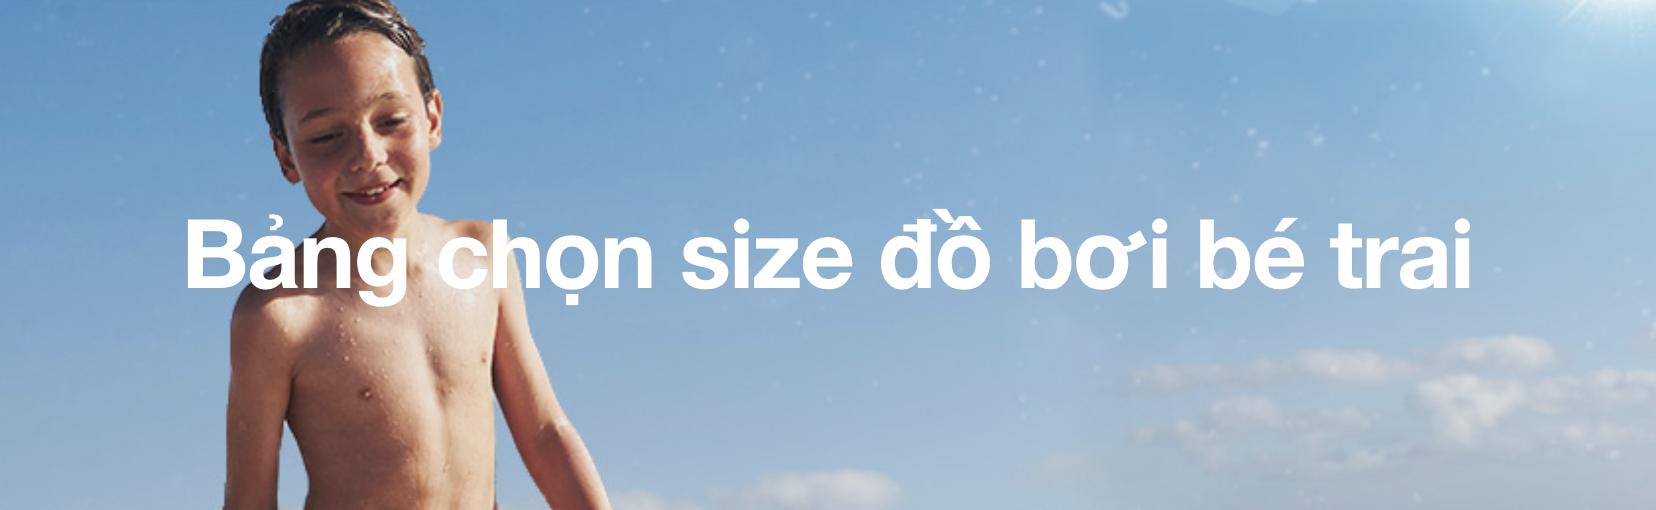 Bảng chọn size đồ bơi bé trai Speedo @ ULA Vietnam - Premium Online Shopping